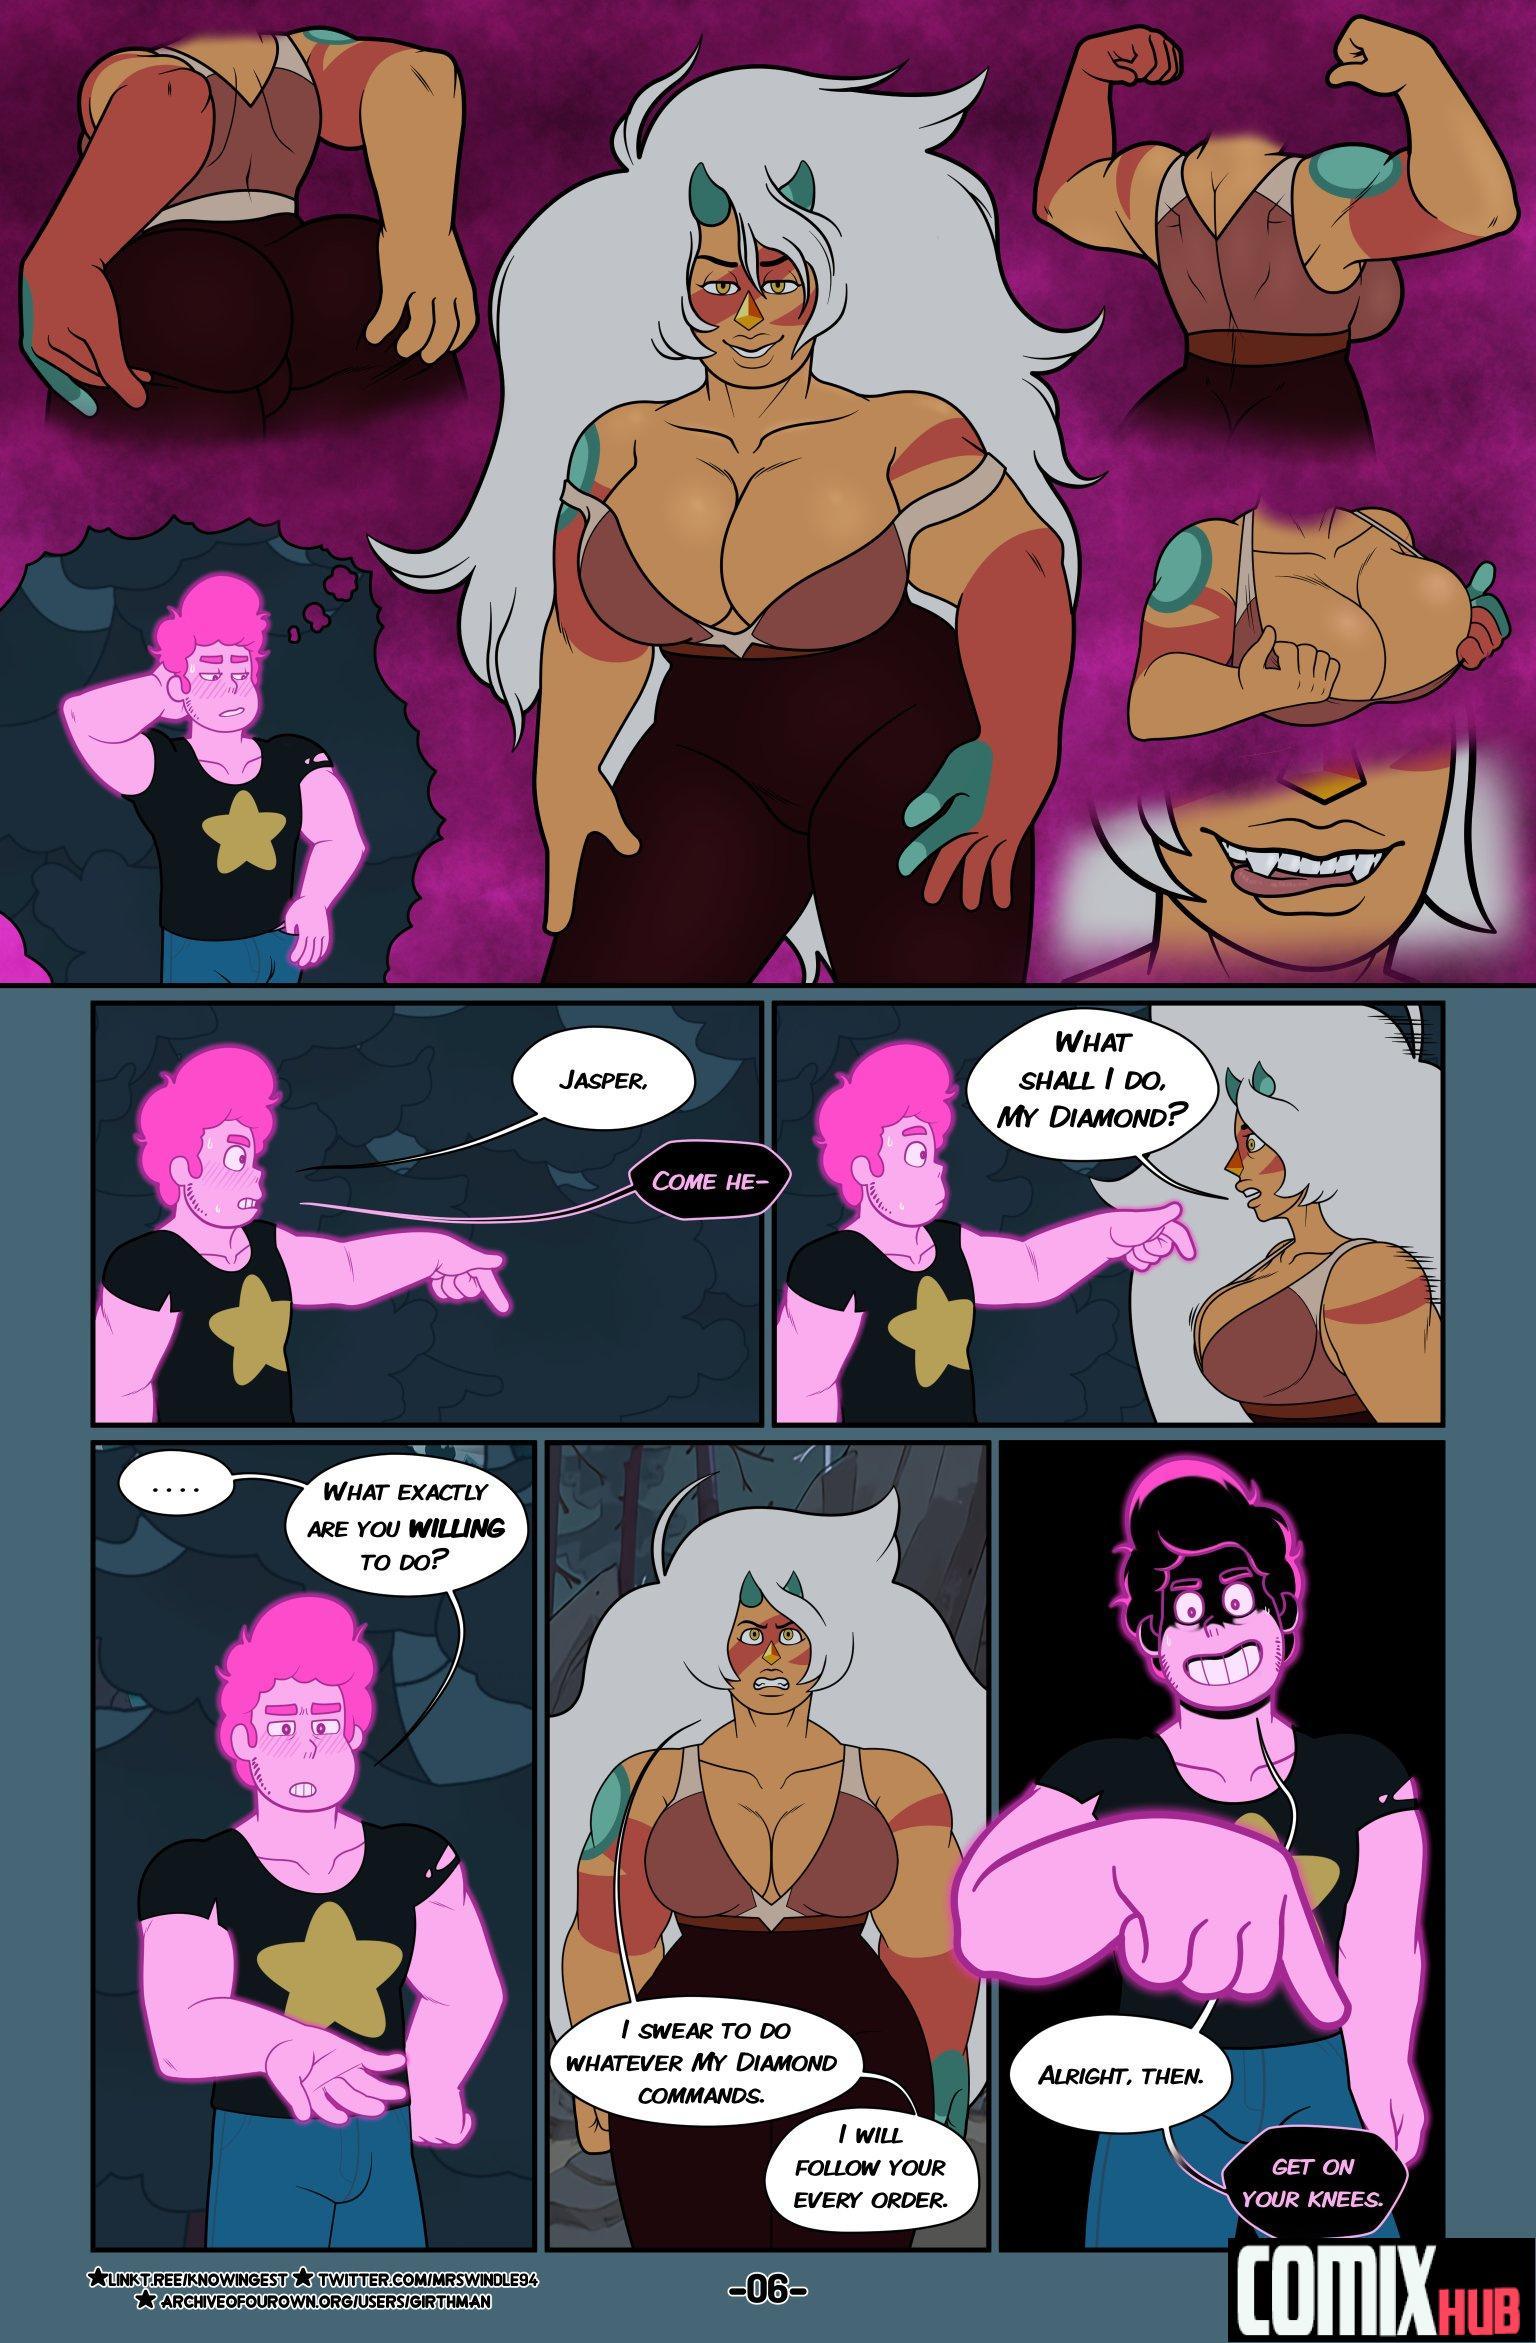 Steven Universe Fervor 1 Oral sex, Big Tits, Blowjob, Cum Swallow, Domination, Fantasy, Monster Girls, Submission